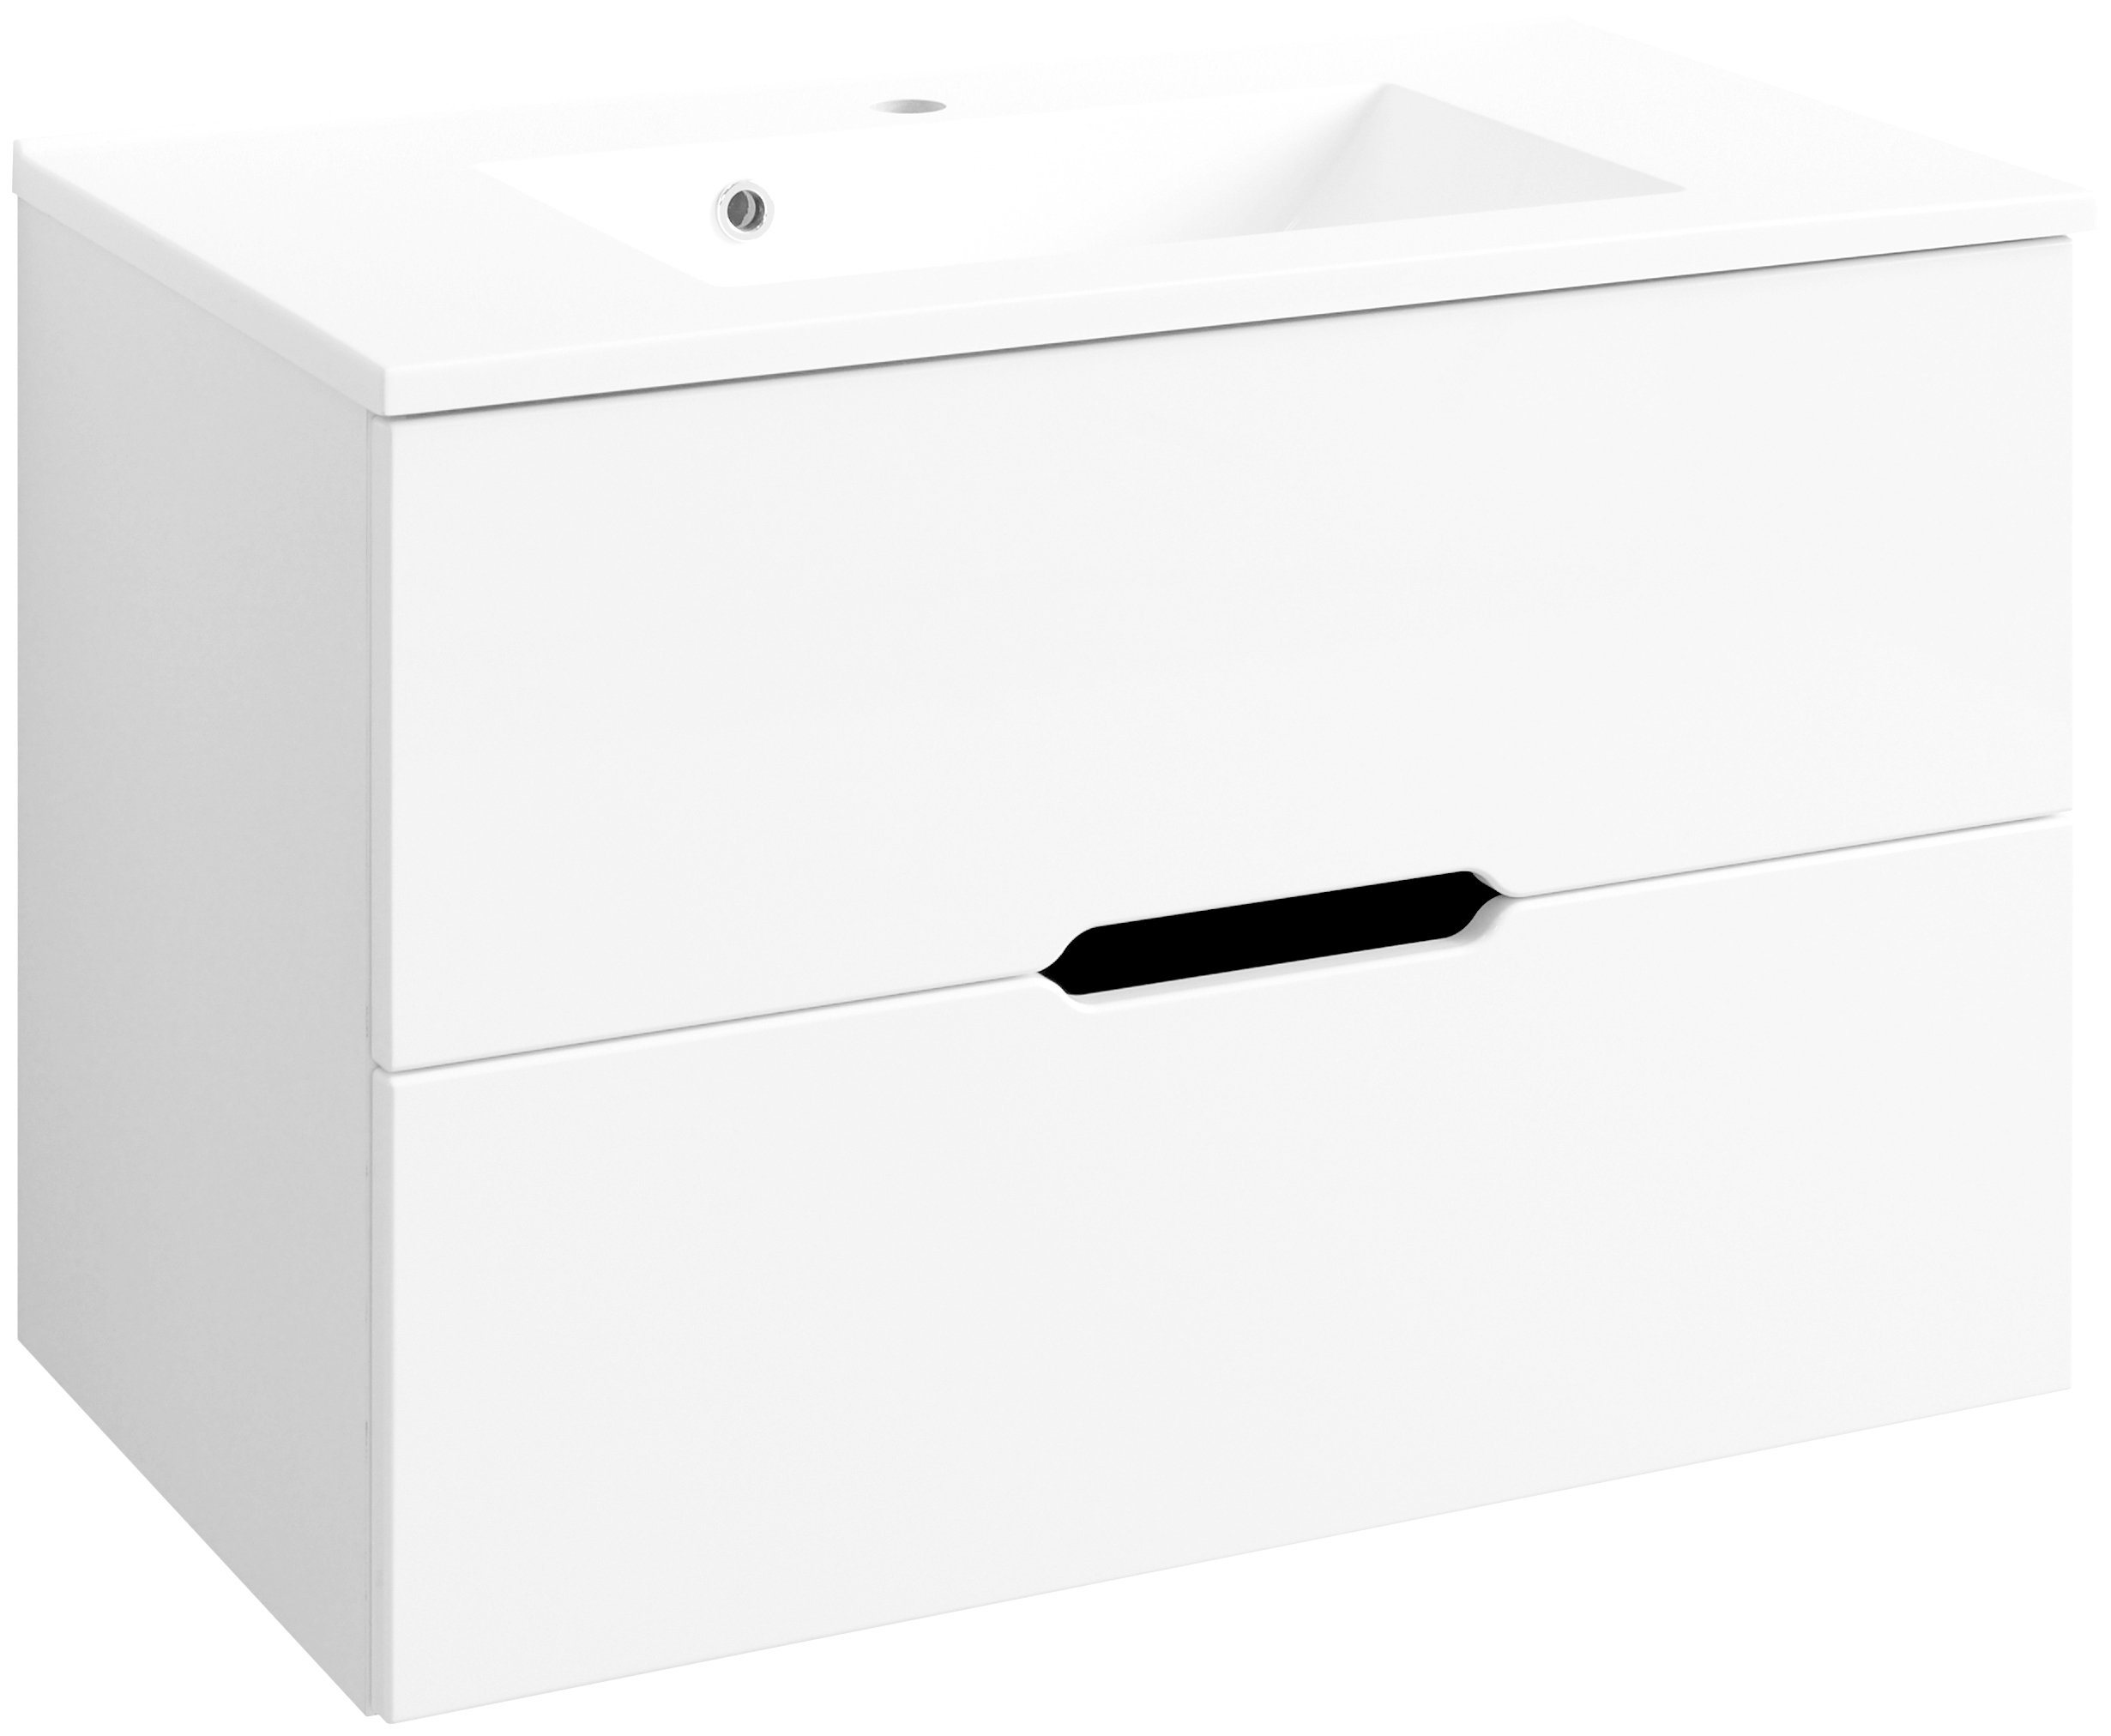 HELD MÖBEL Waschtisch »Belluno «, Breite 80 cm, (2-tlg.) | Bad > Badmöbel > Badmöbel-Sets | Spanplatte | HELD MÖBEL